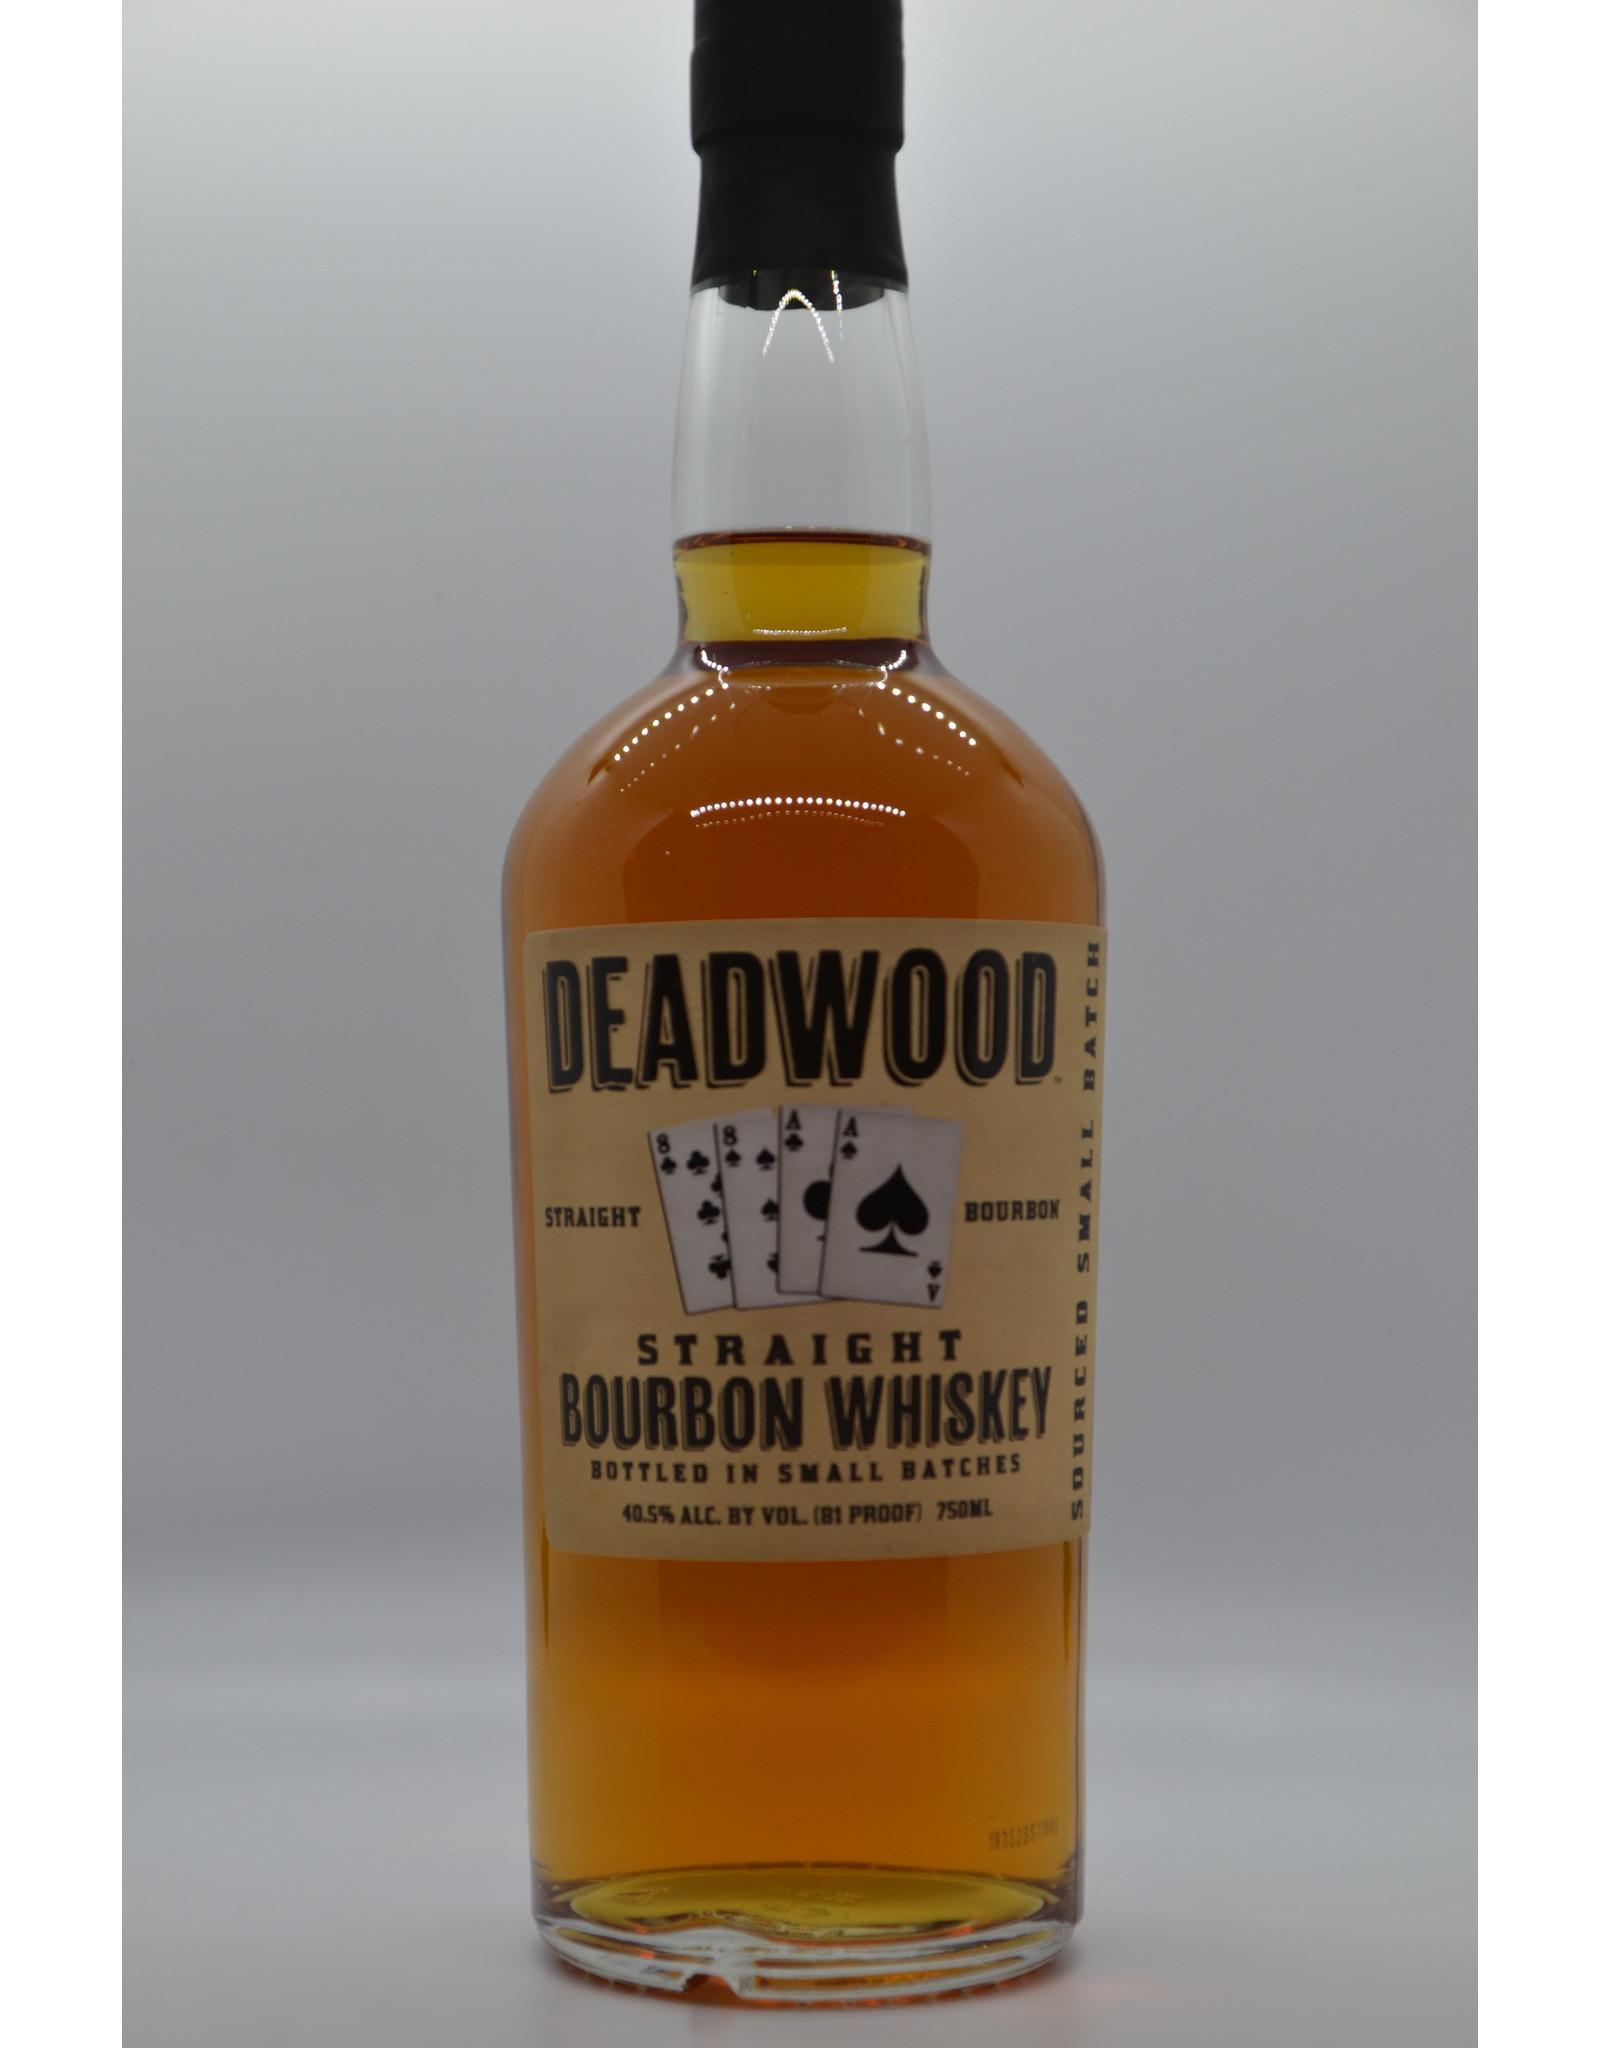 USA Deadwood Straight Bourbon